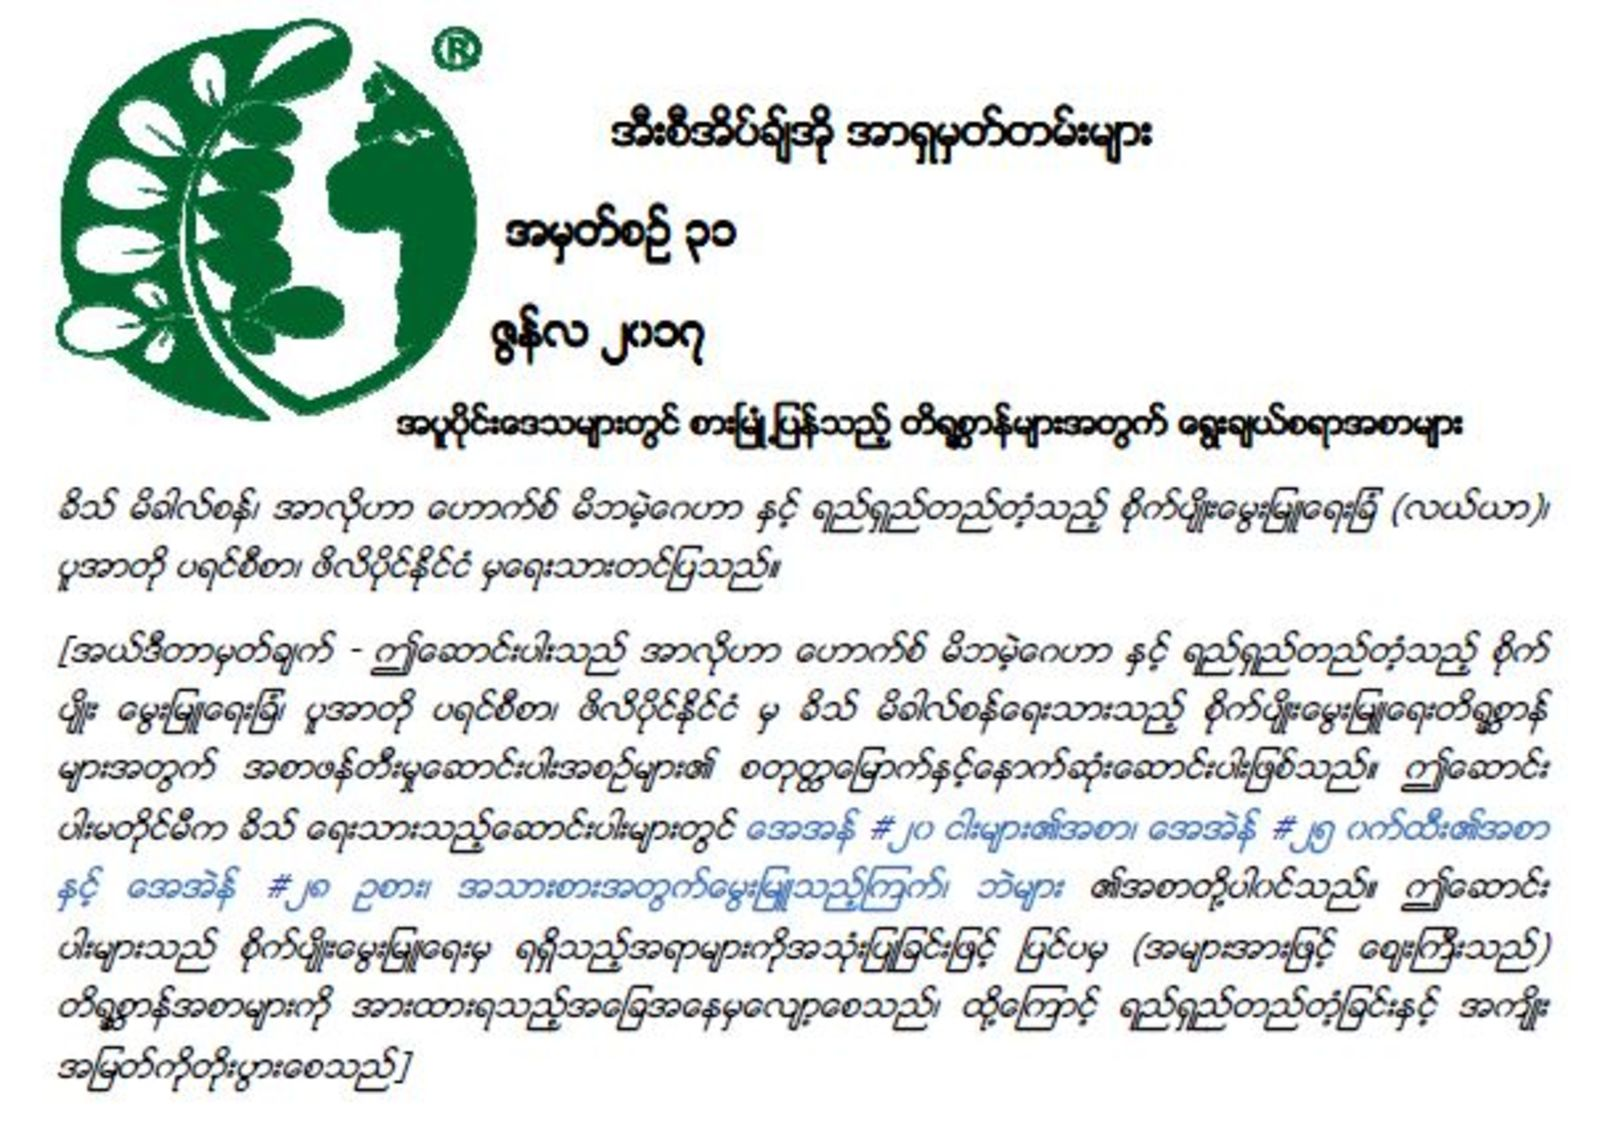 Burmese AN31 Ruminant feed screenshot   ECHOcommunity org